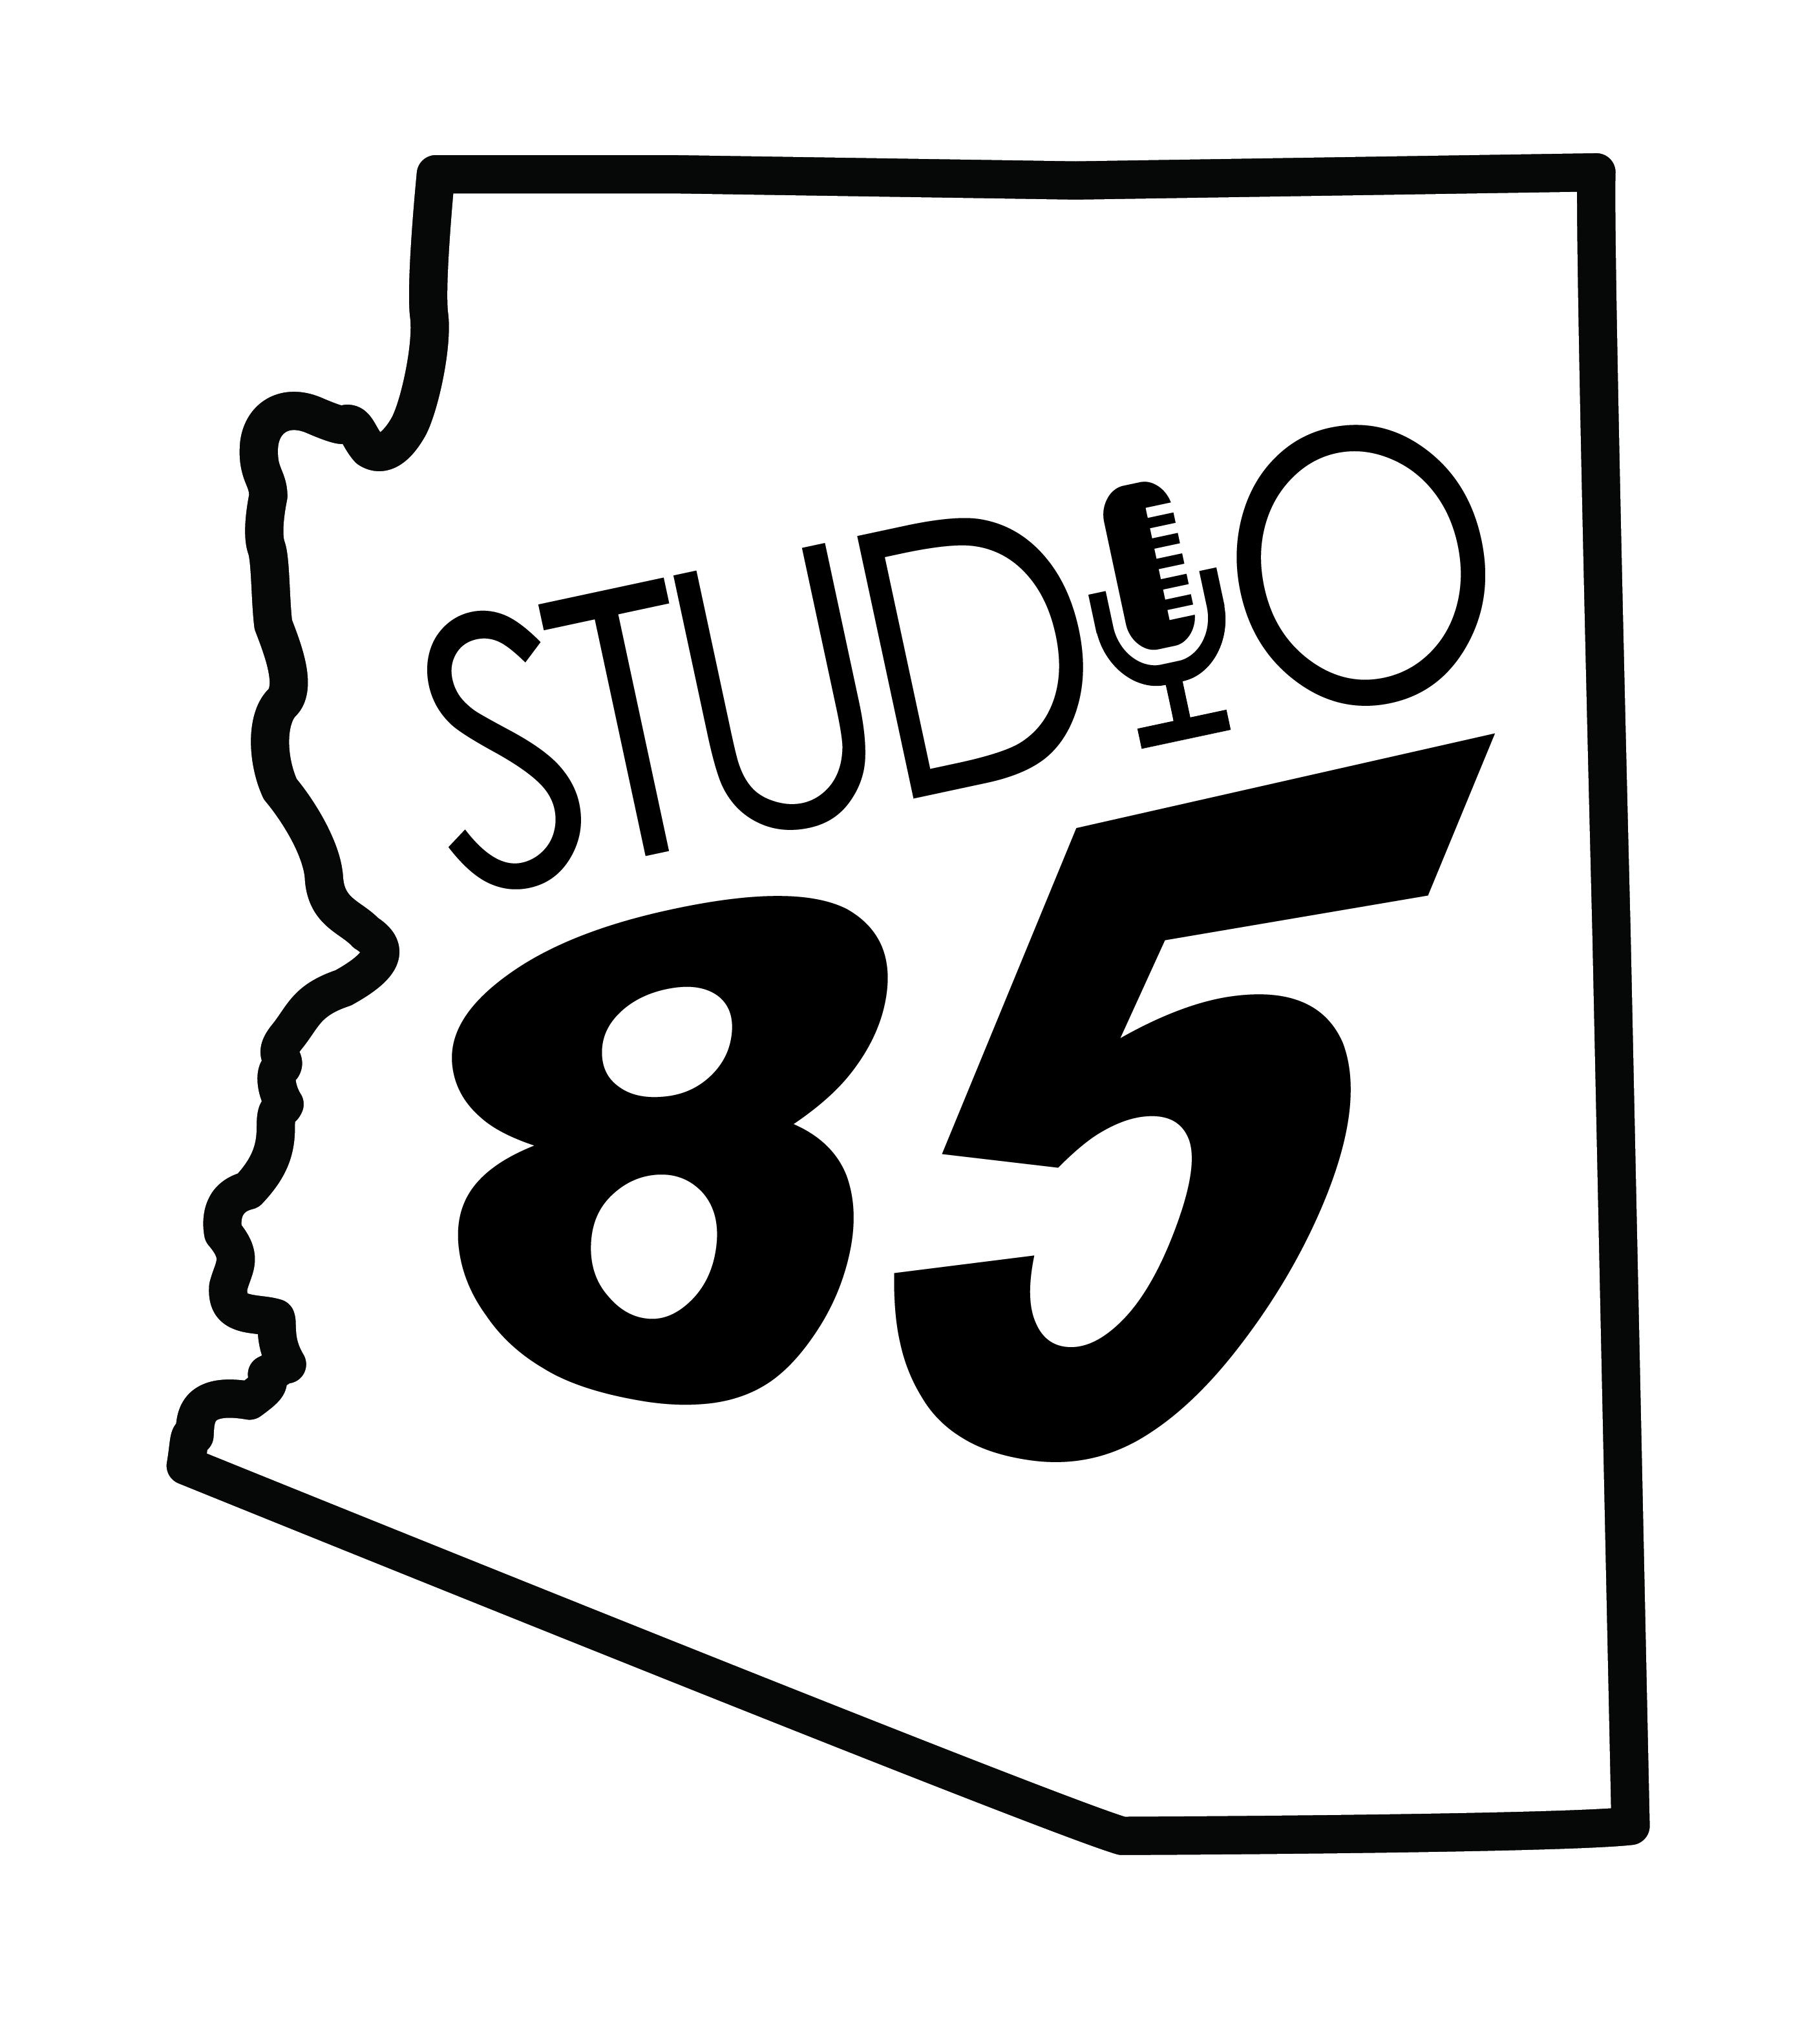 Studio 85 logo